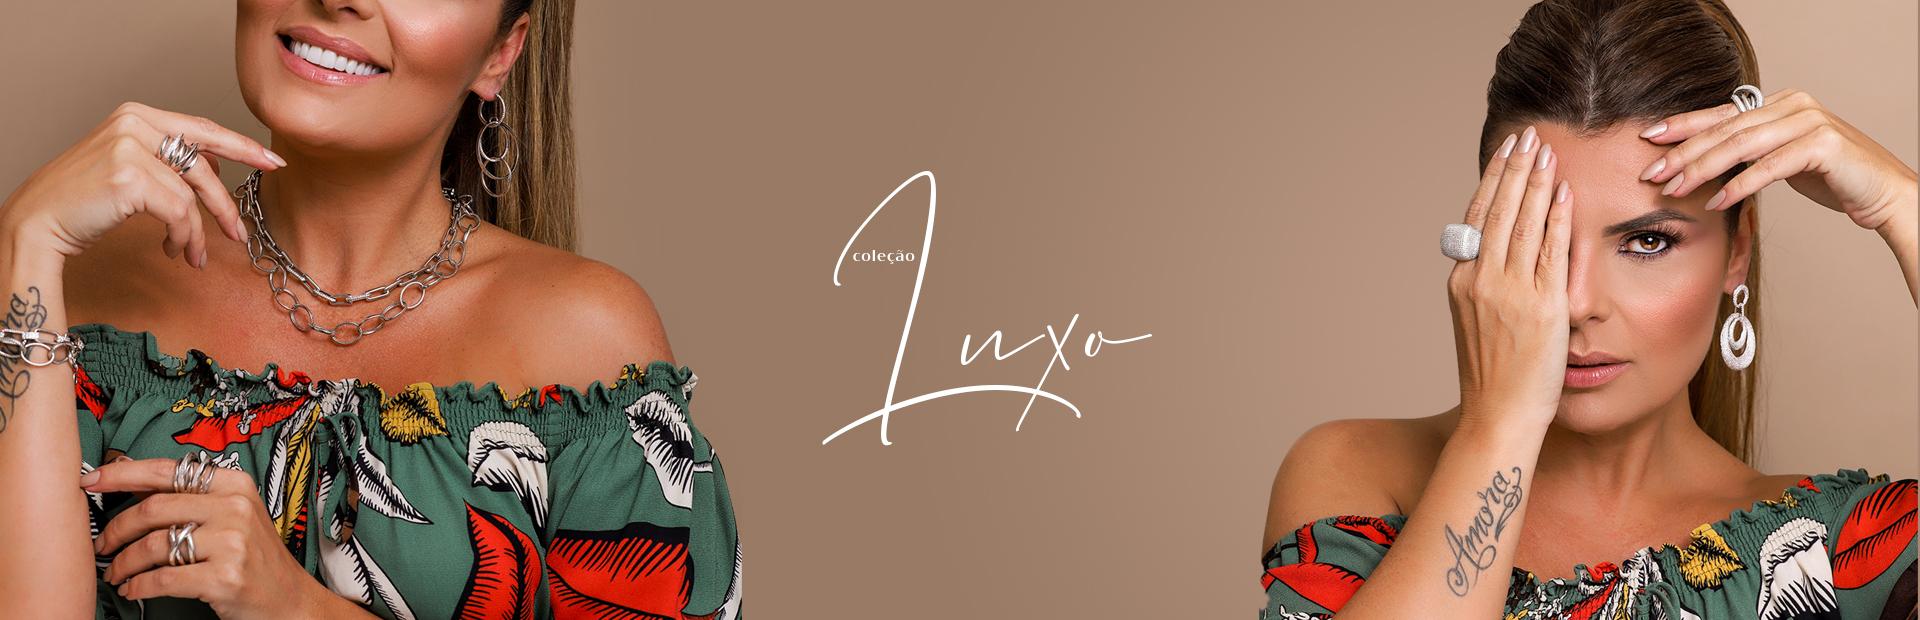 Colecao Luxo